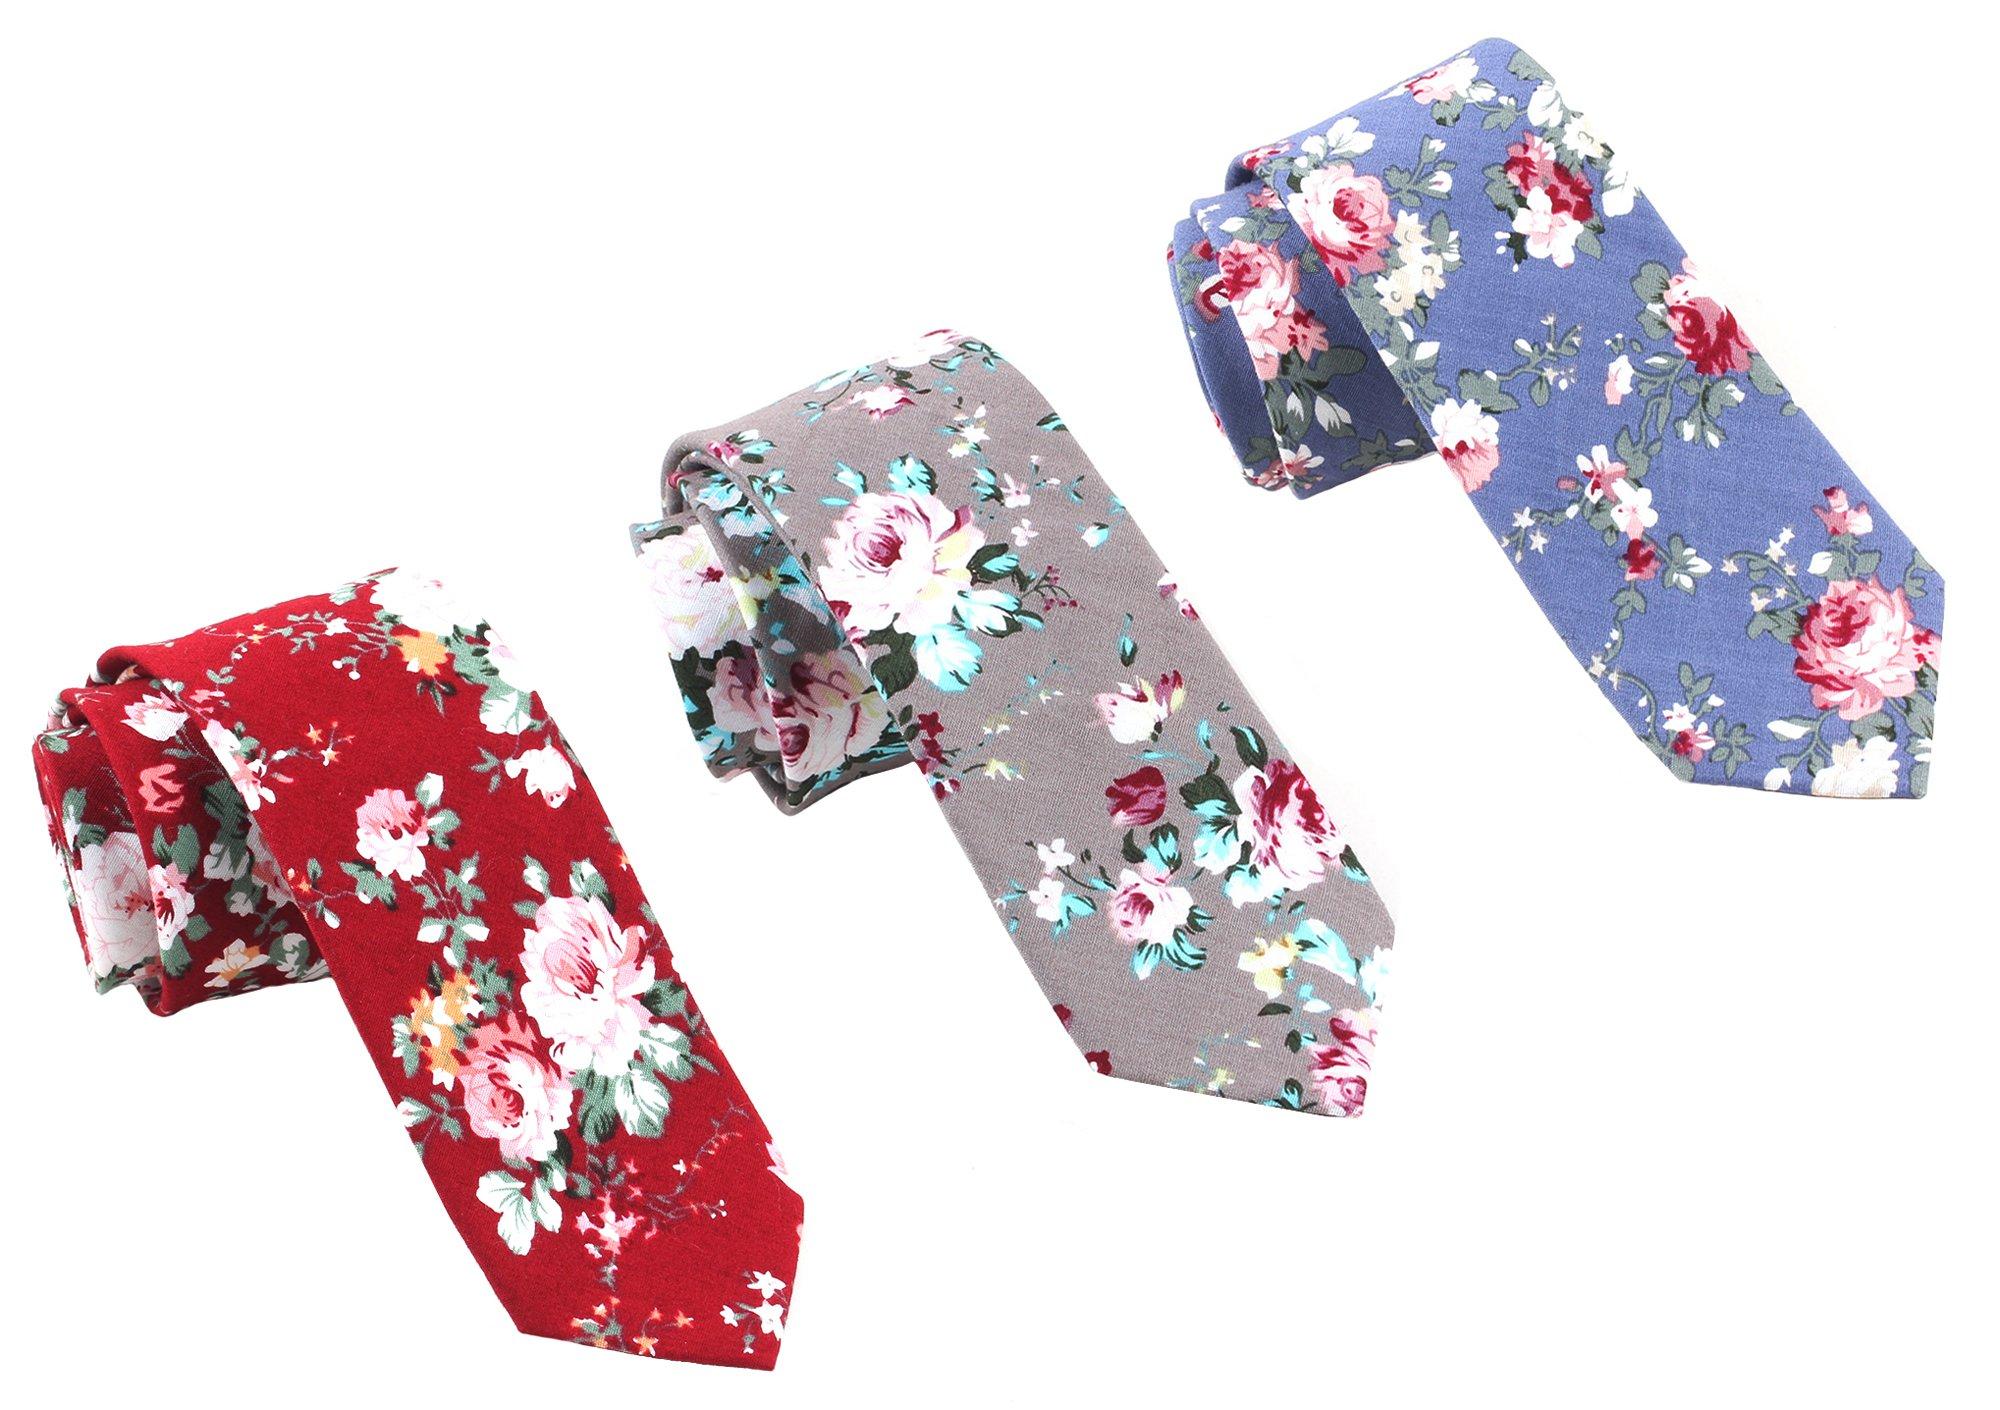 Levao-Men's Skinny Tie Floral Cotton Neck Ties for Men 210368,69,78 Mix3-F